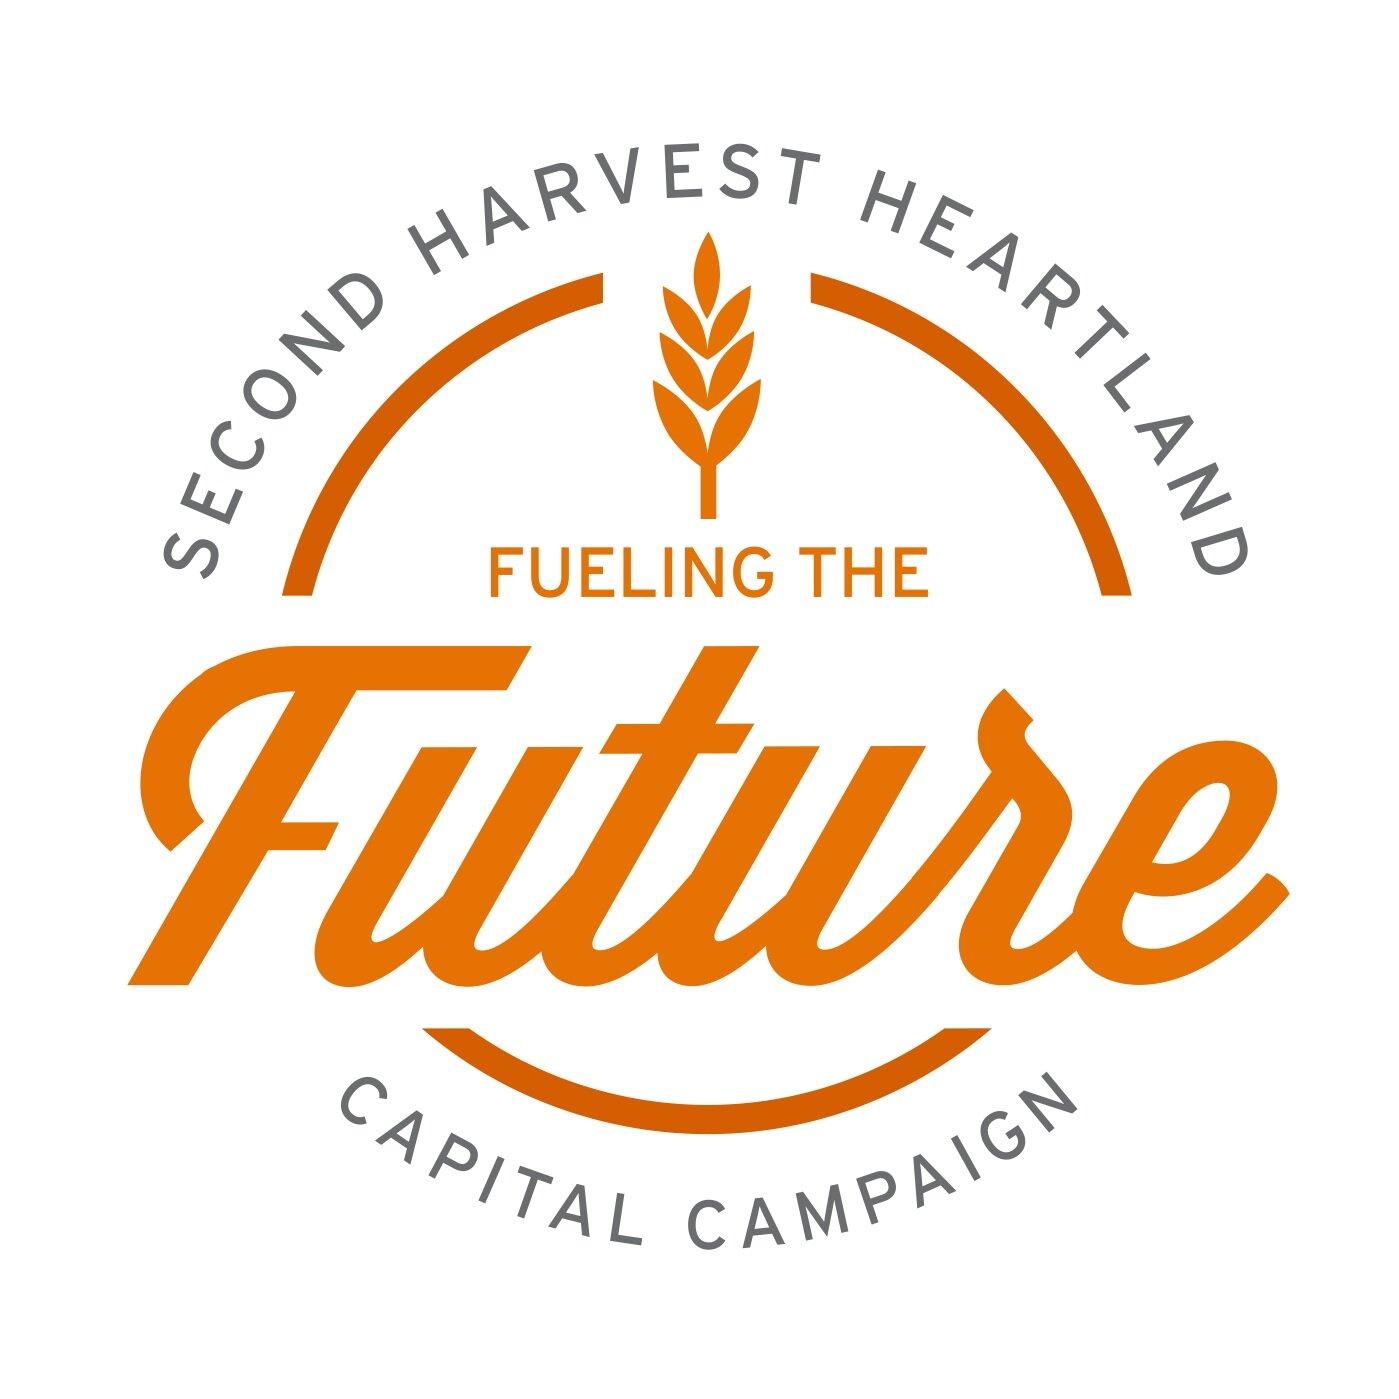 Second Harvest Heartland Capital Campaign